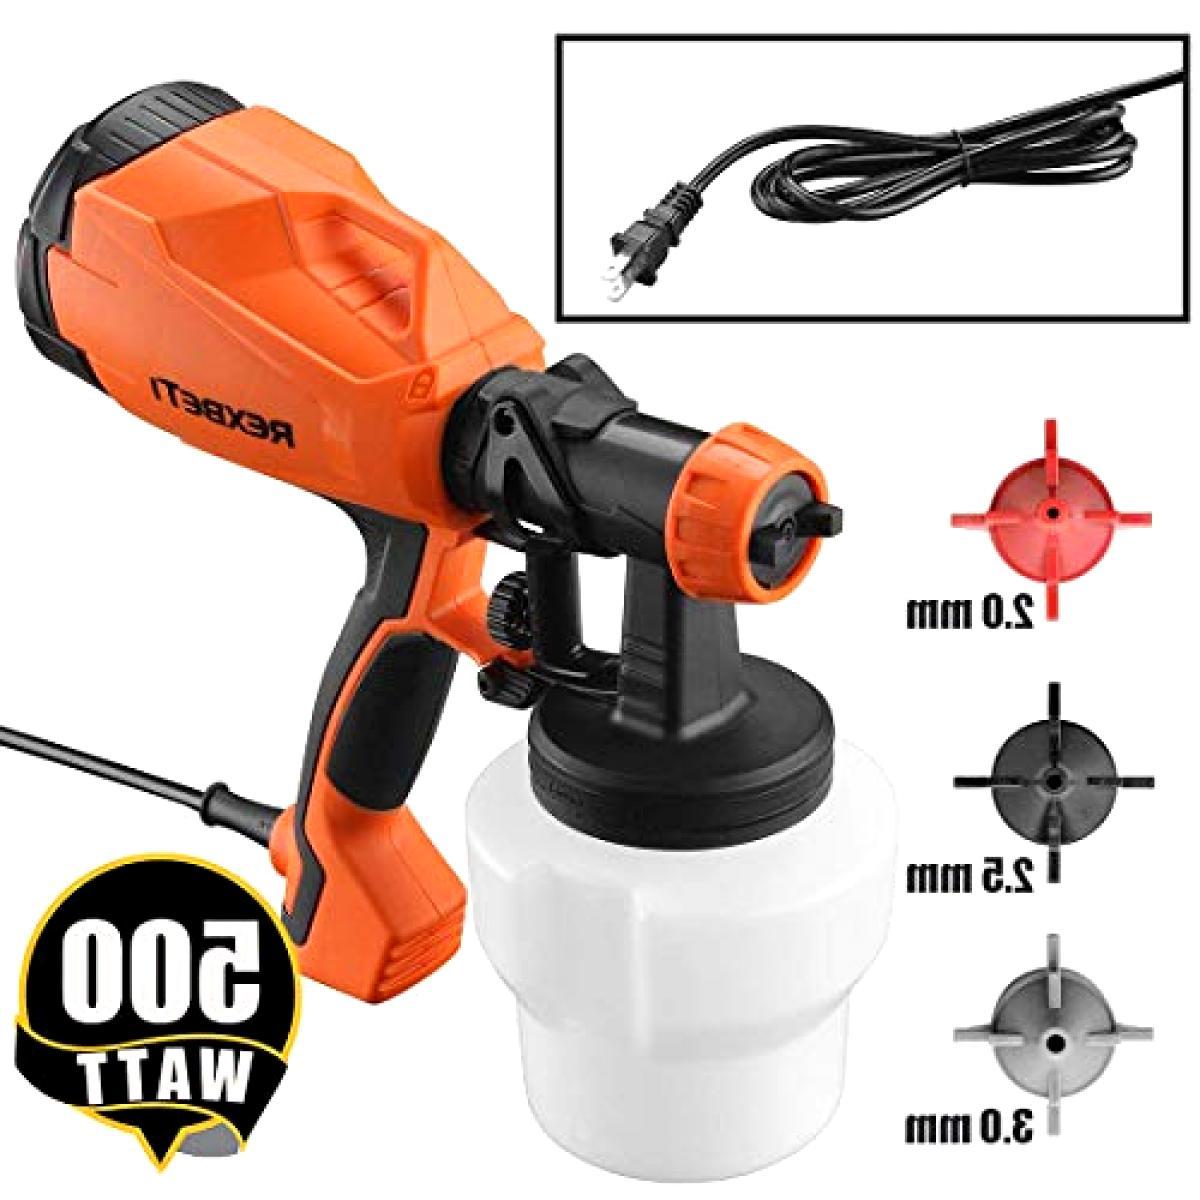 REXBETI Paint Sprayer, 500 HVLP Home Gun, 3 Nozzle Lightweight, Easy and